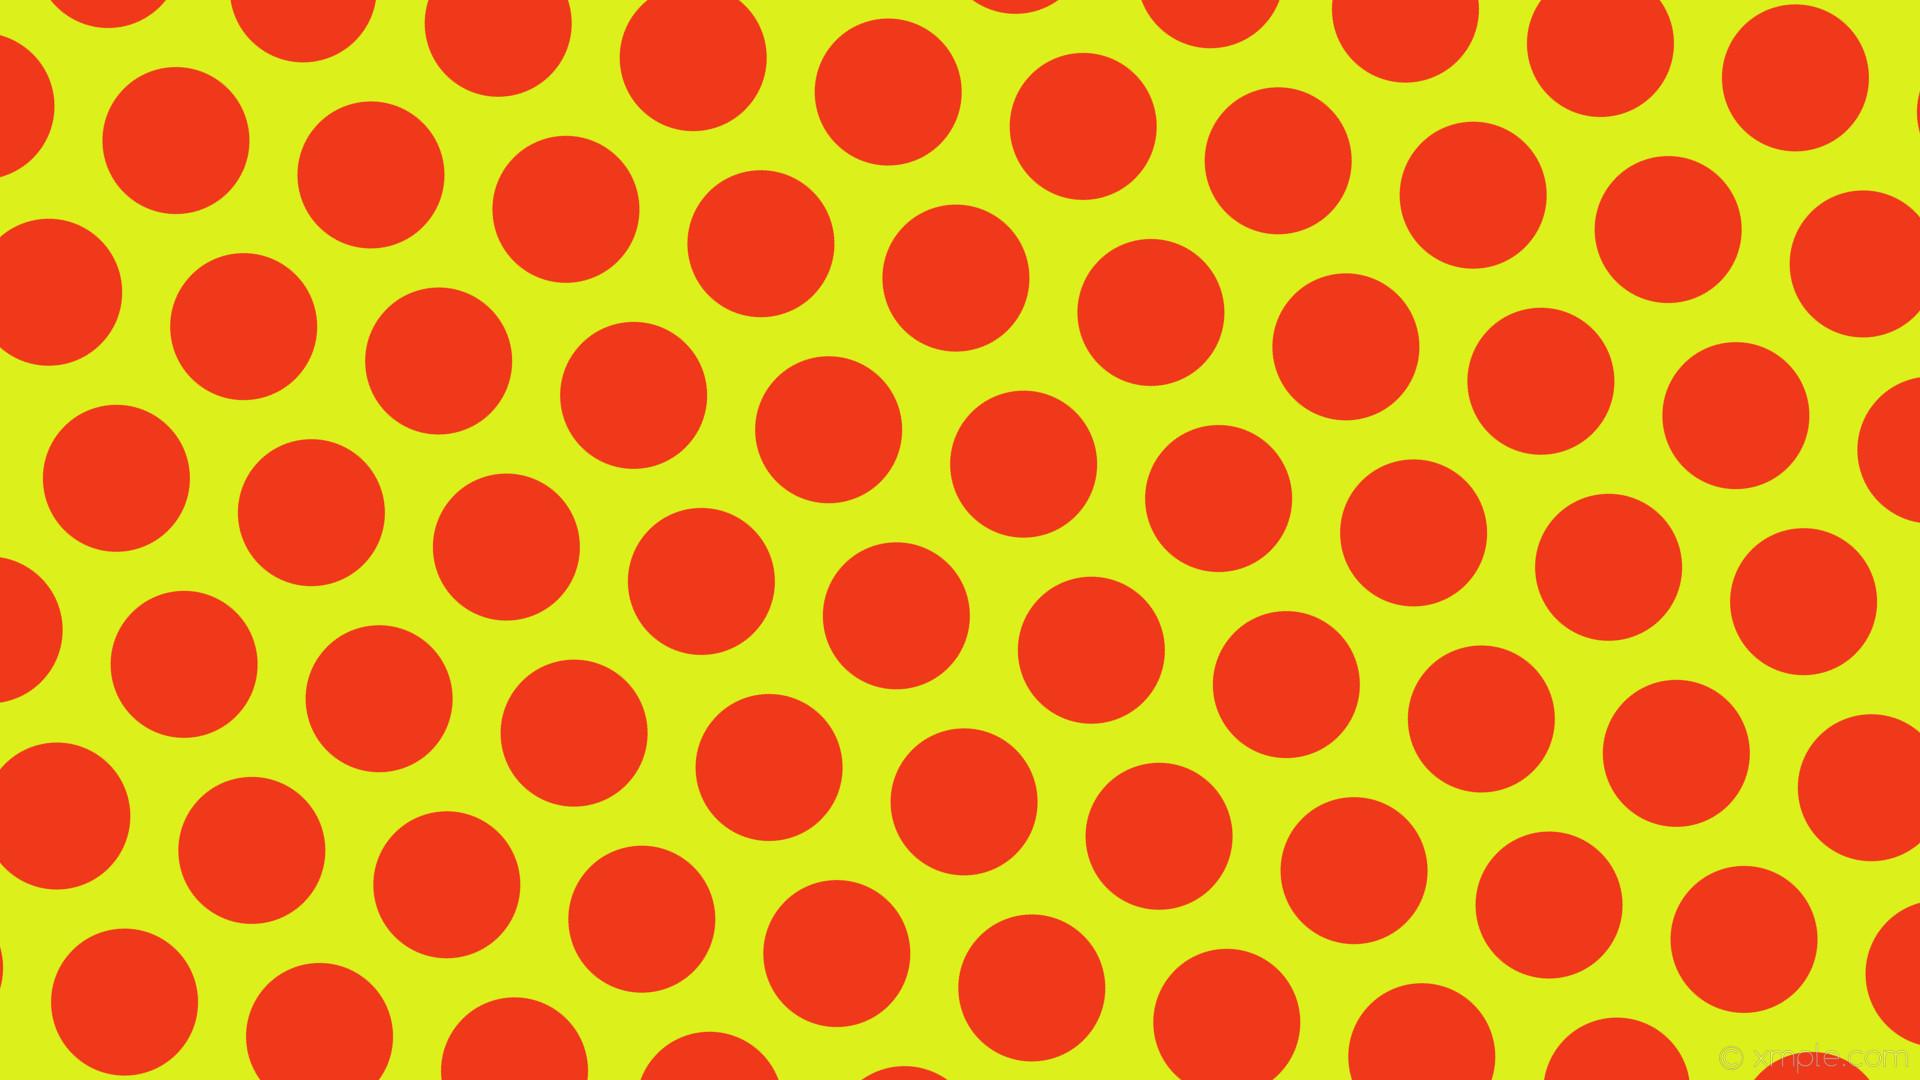 wallpaper red polka dots yellow hexagon #dcf01b #f0381b diagonal 50° 147px  198px